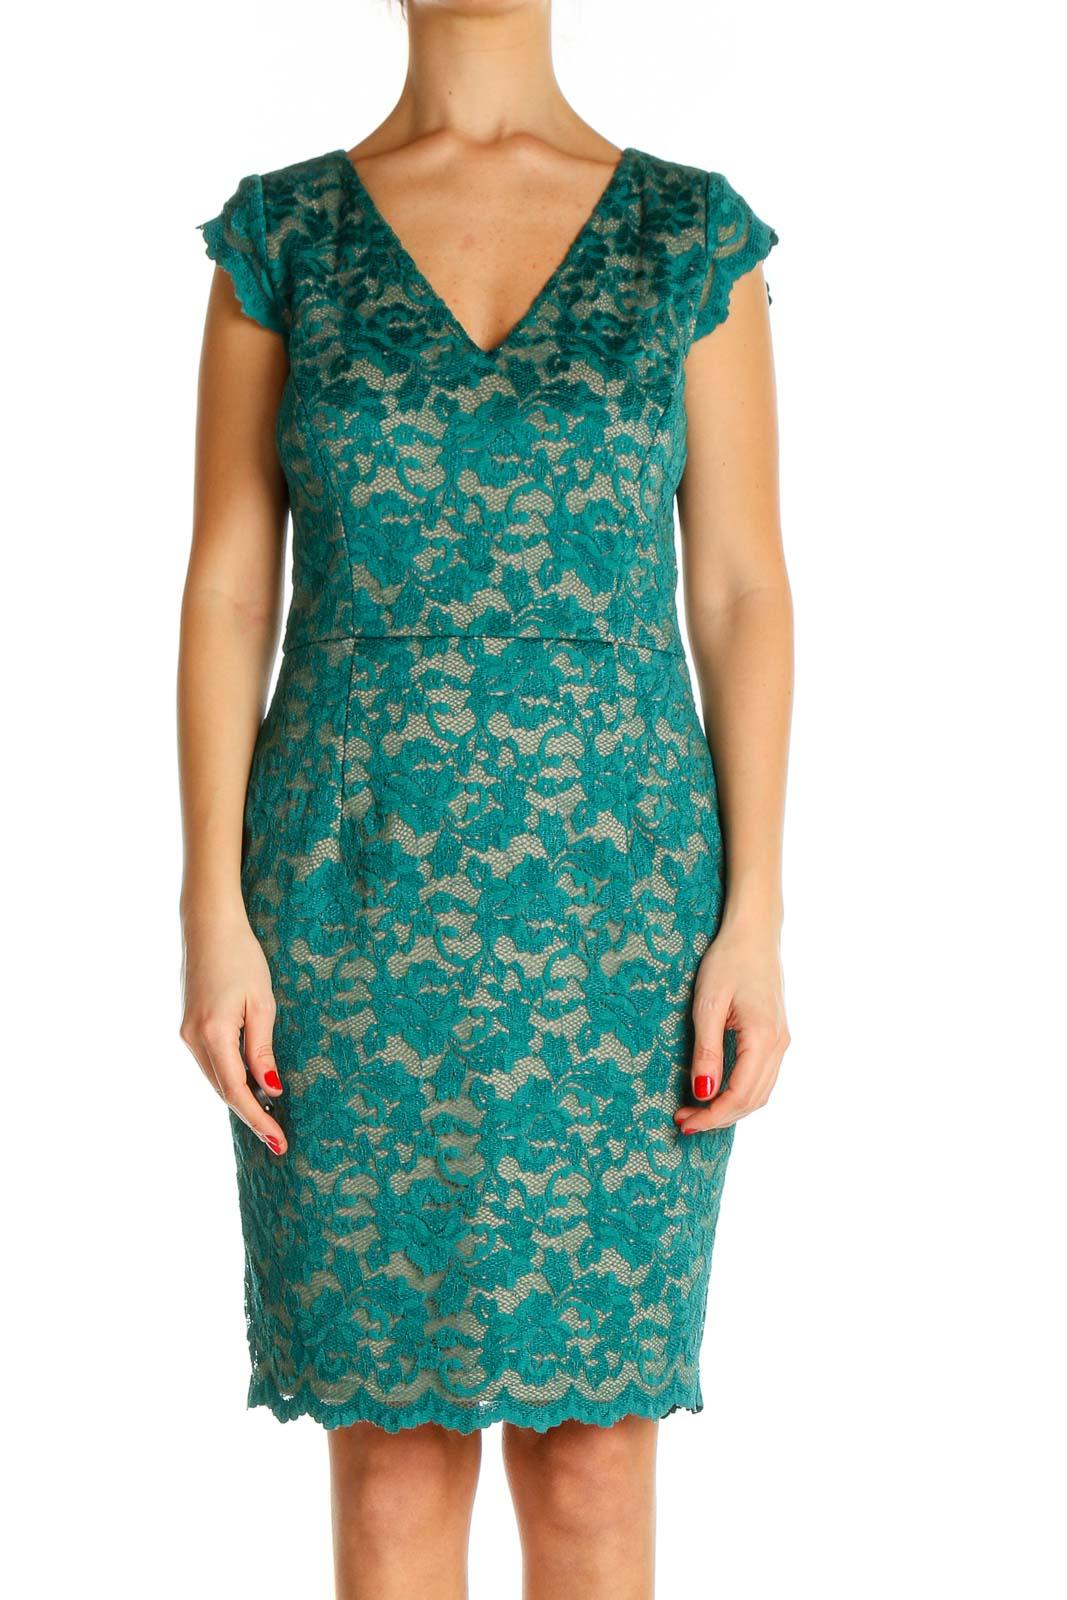 Green Lace Bohemian Sheath Dress Front